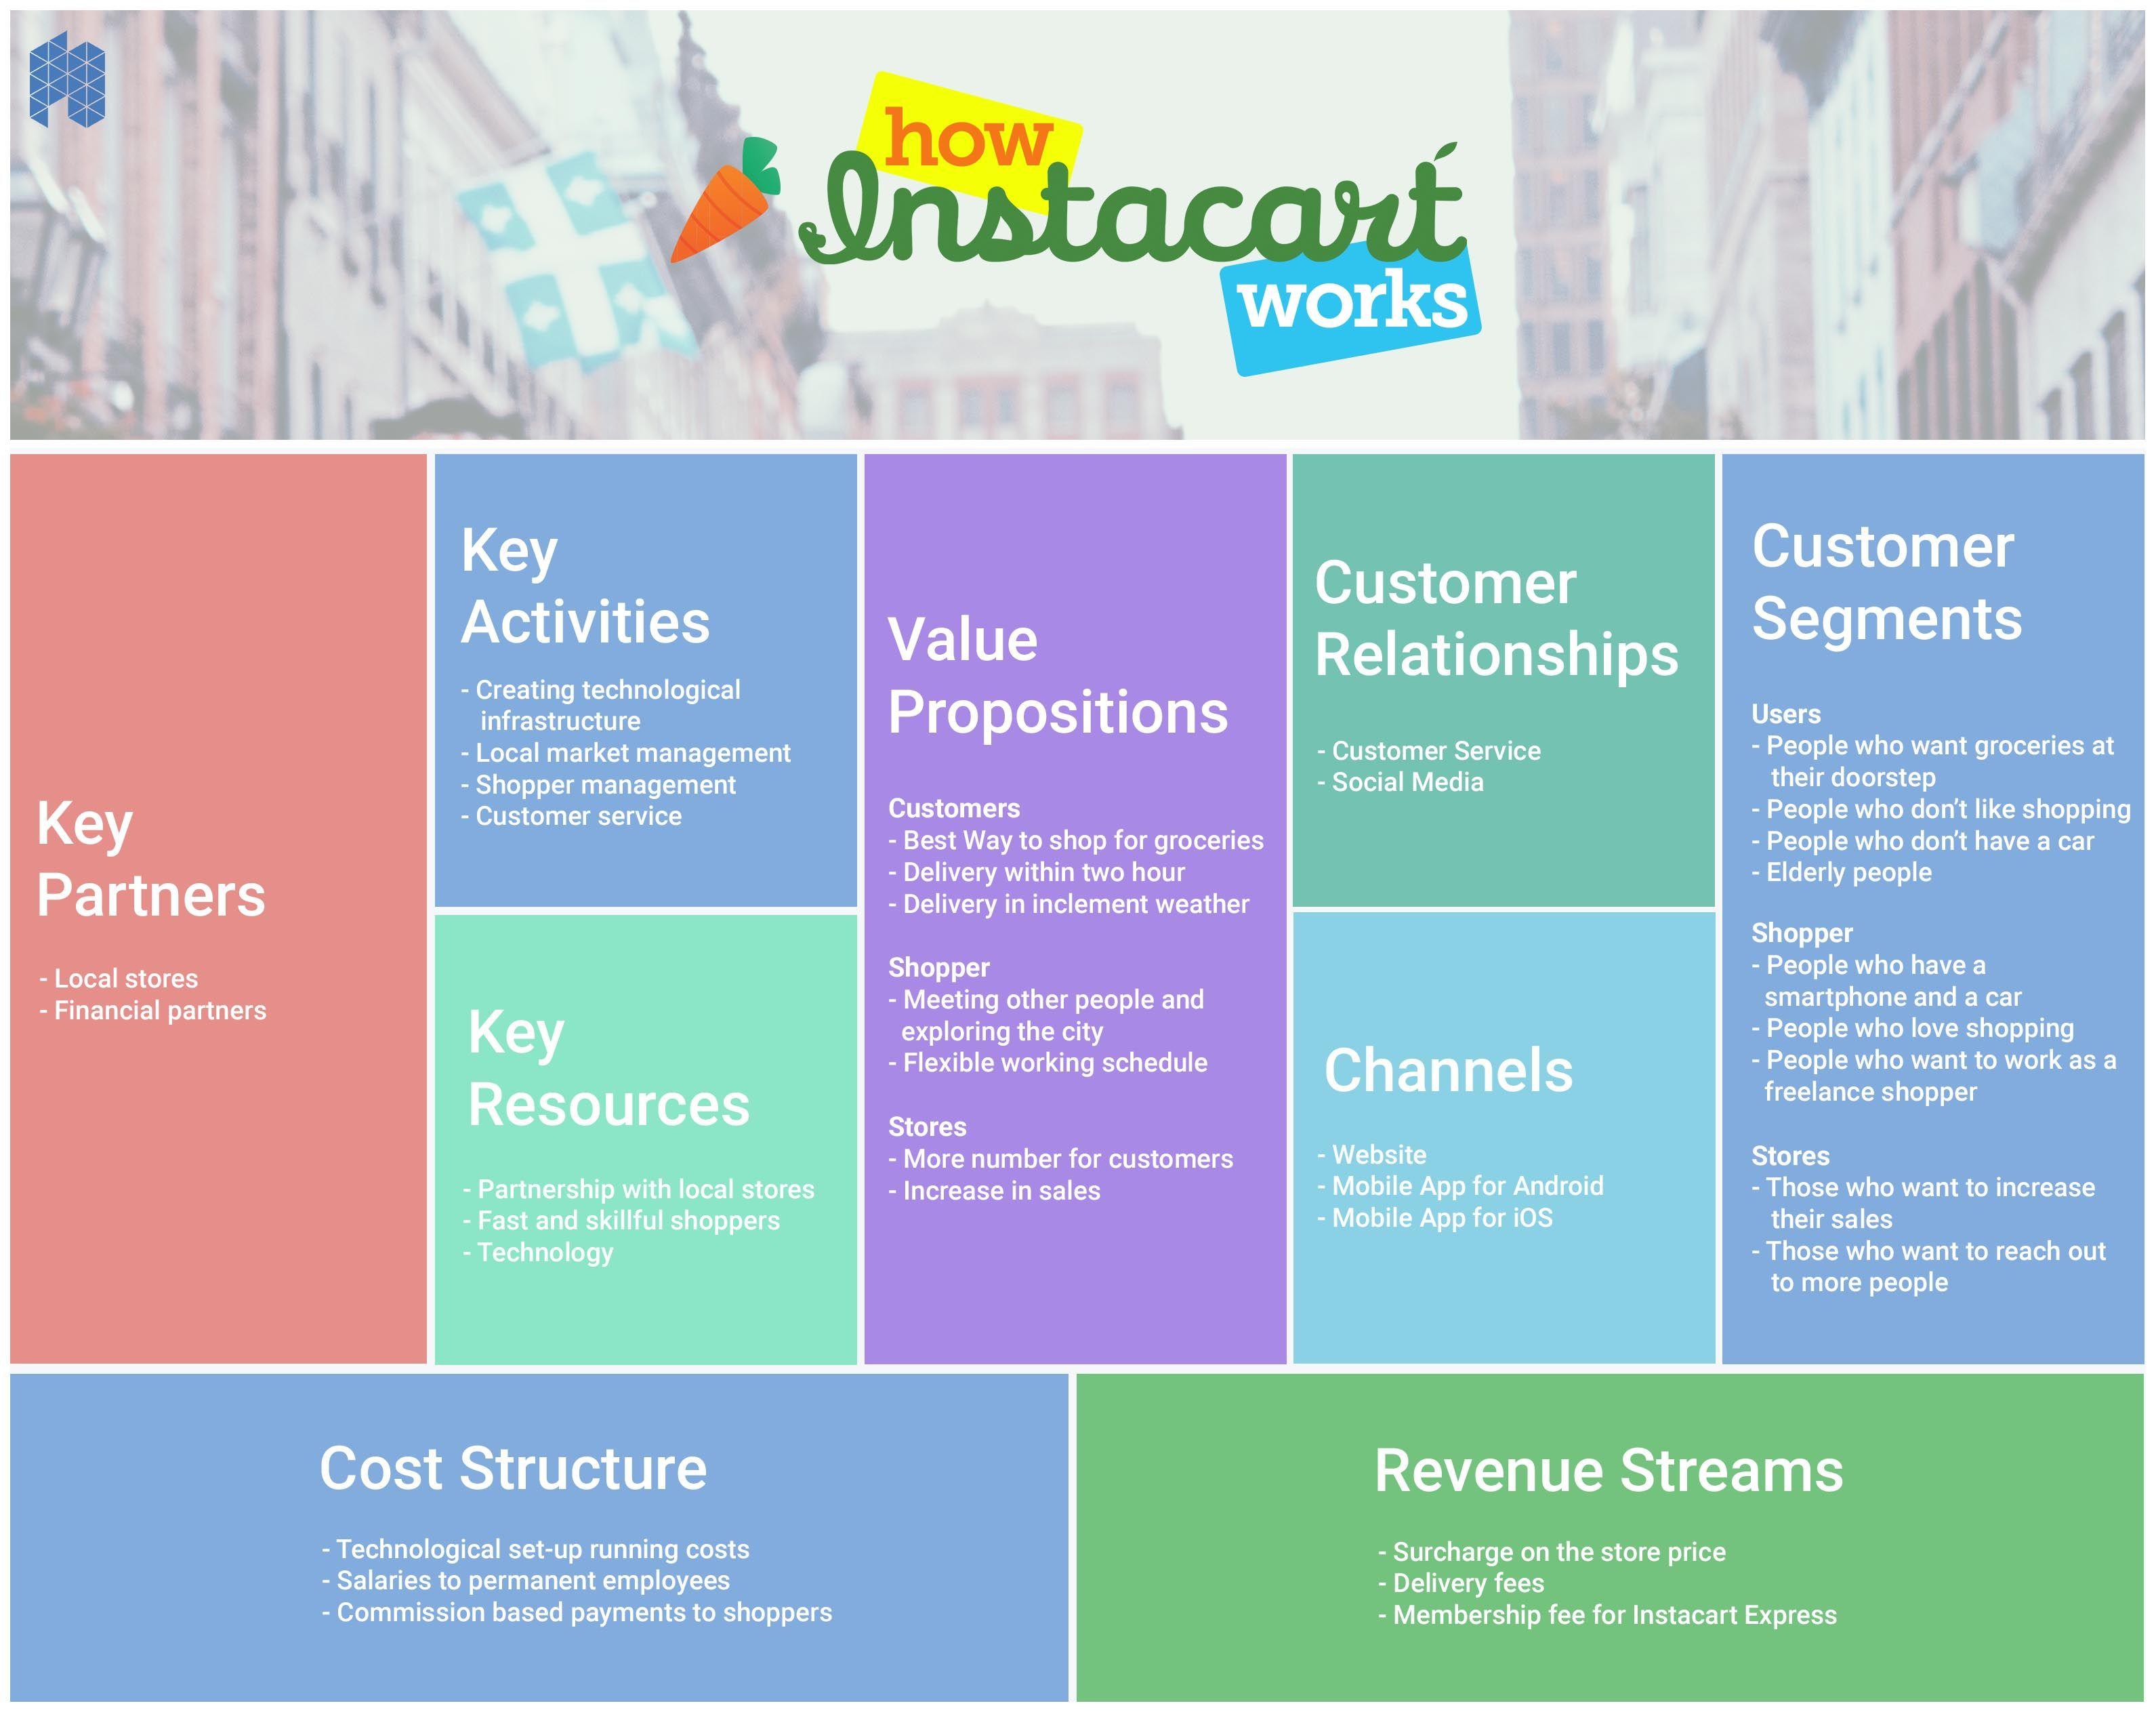 How Instacart Works Comprehensive Business Revenue Model